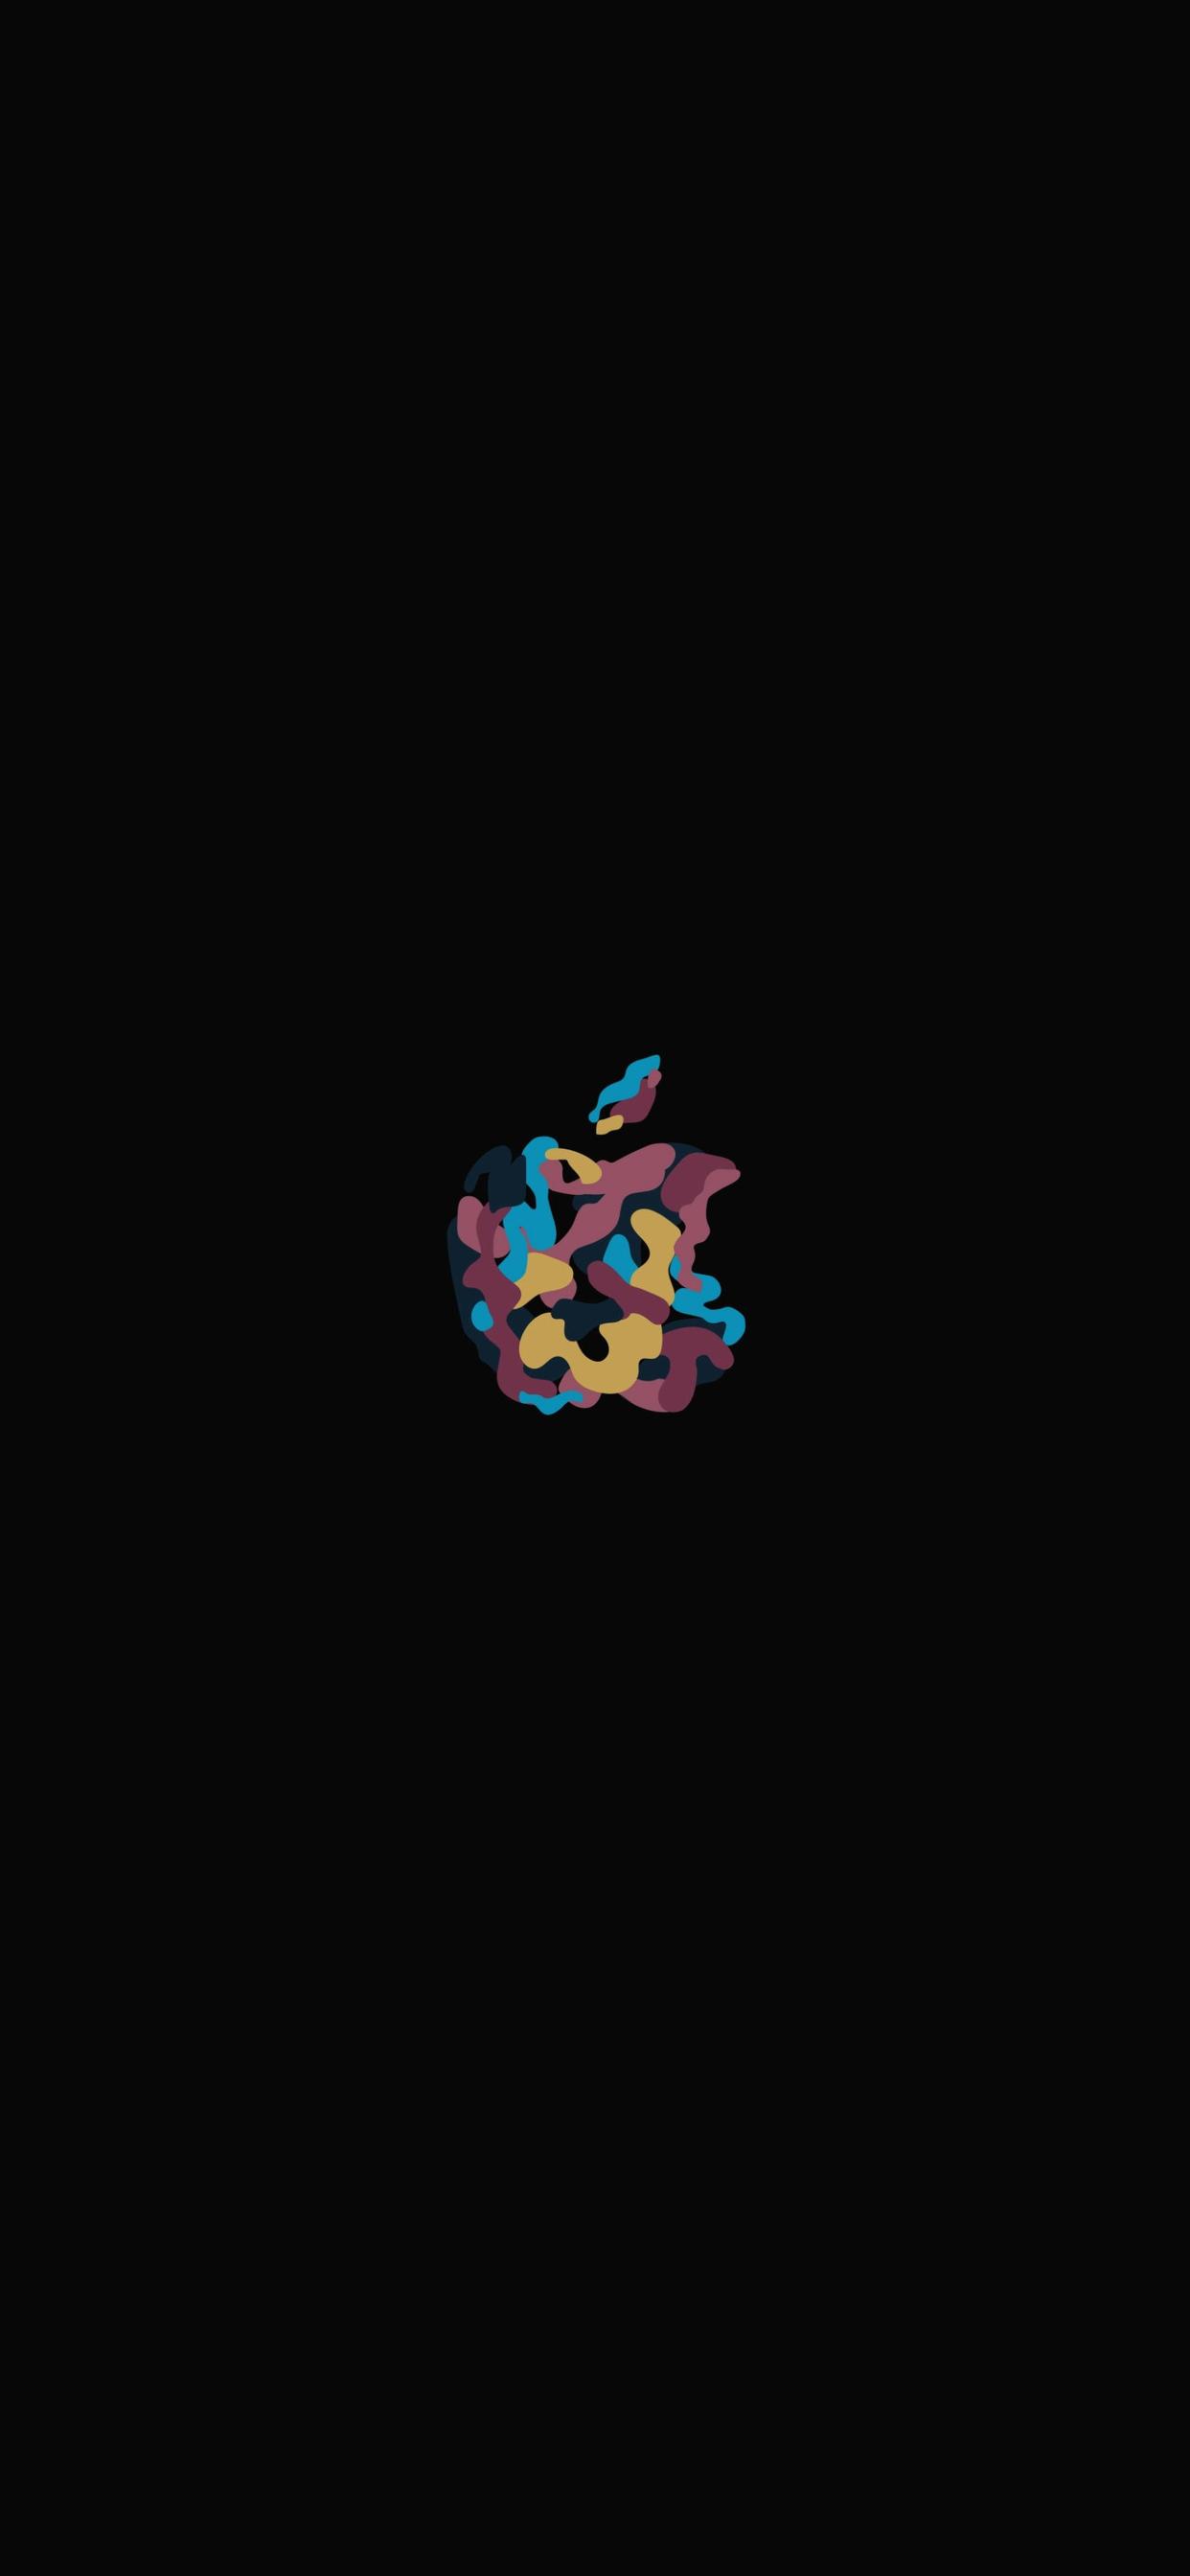 iPhone wallpaper apple logo 24 Apple logo